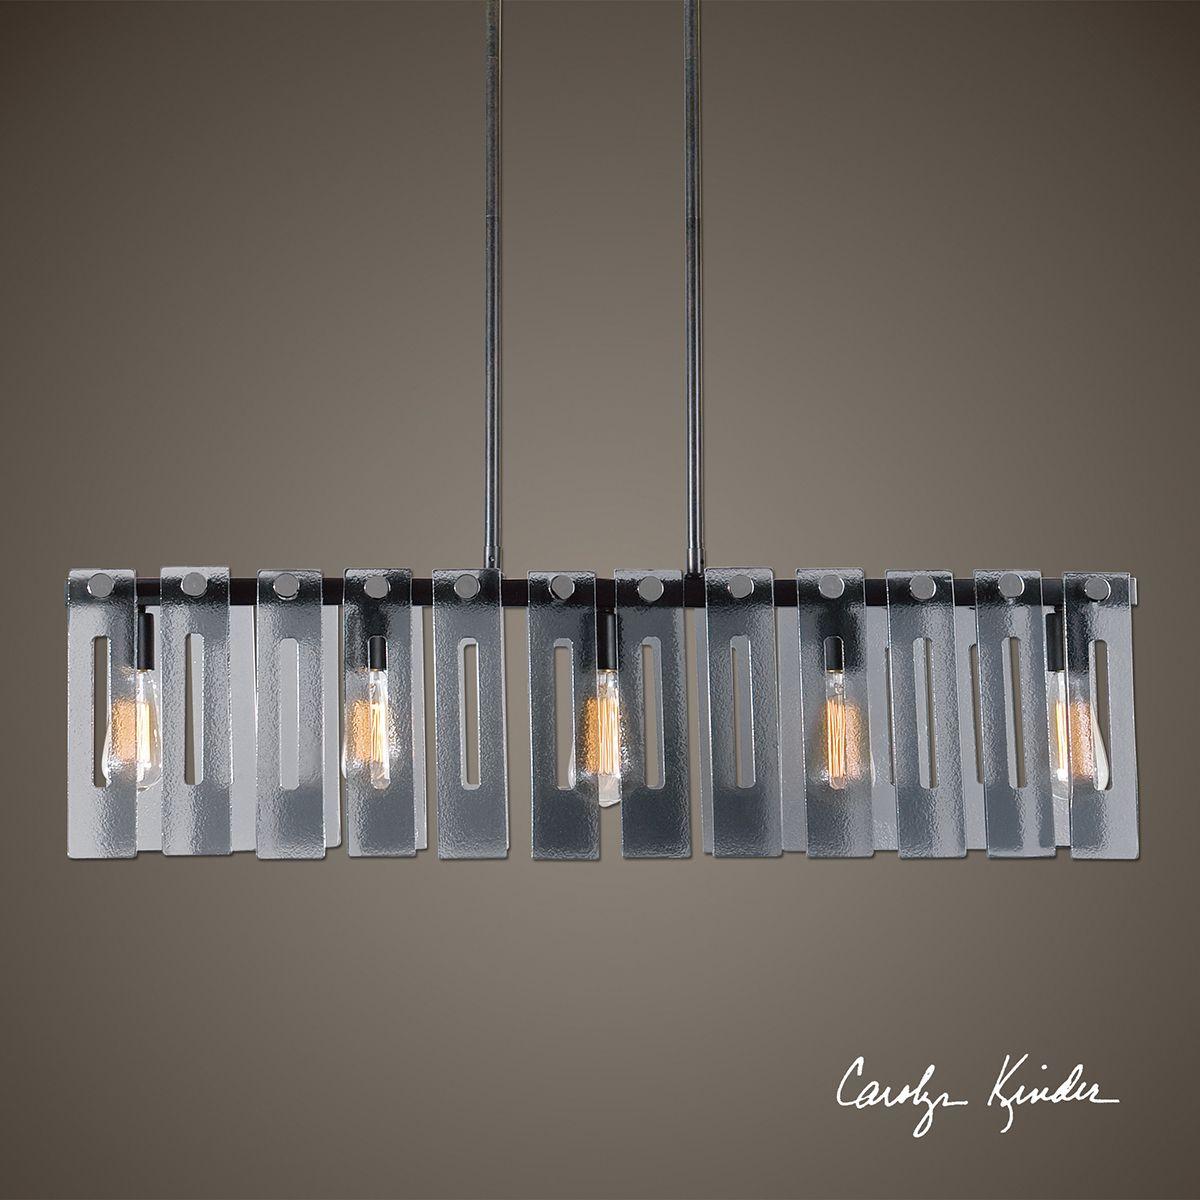 Uttermost Everly Smoke Light Island Light Uttermost - 2 light island chandelier